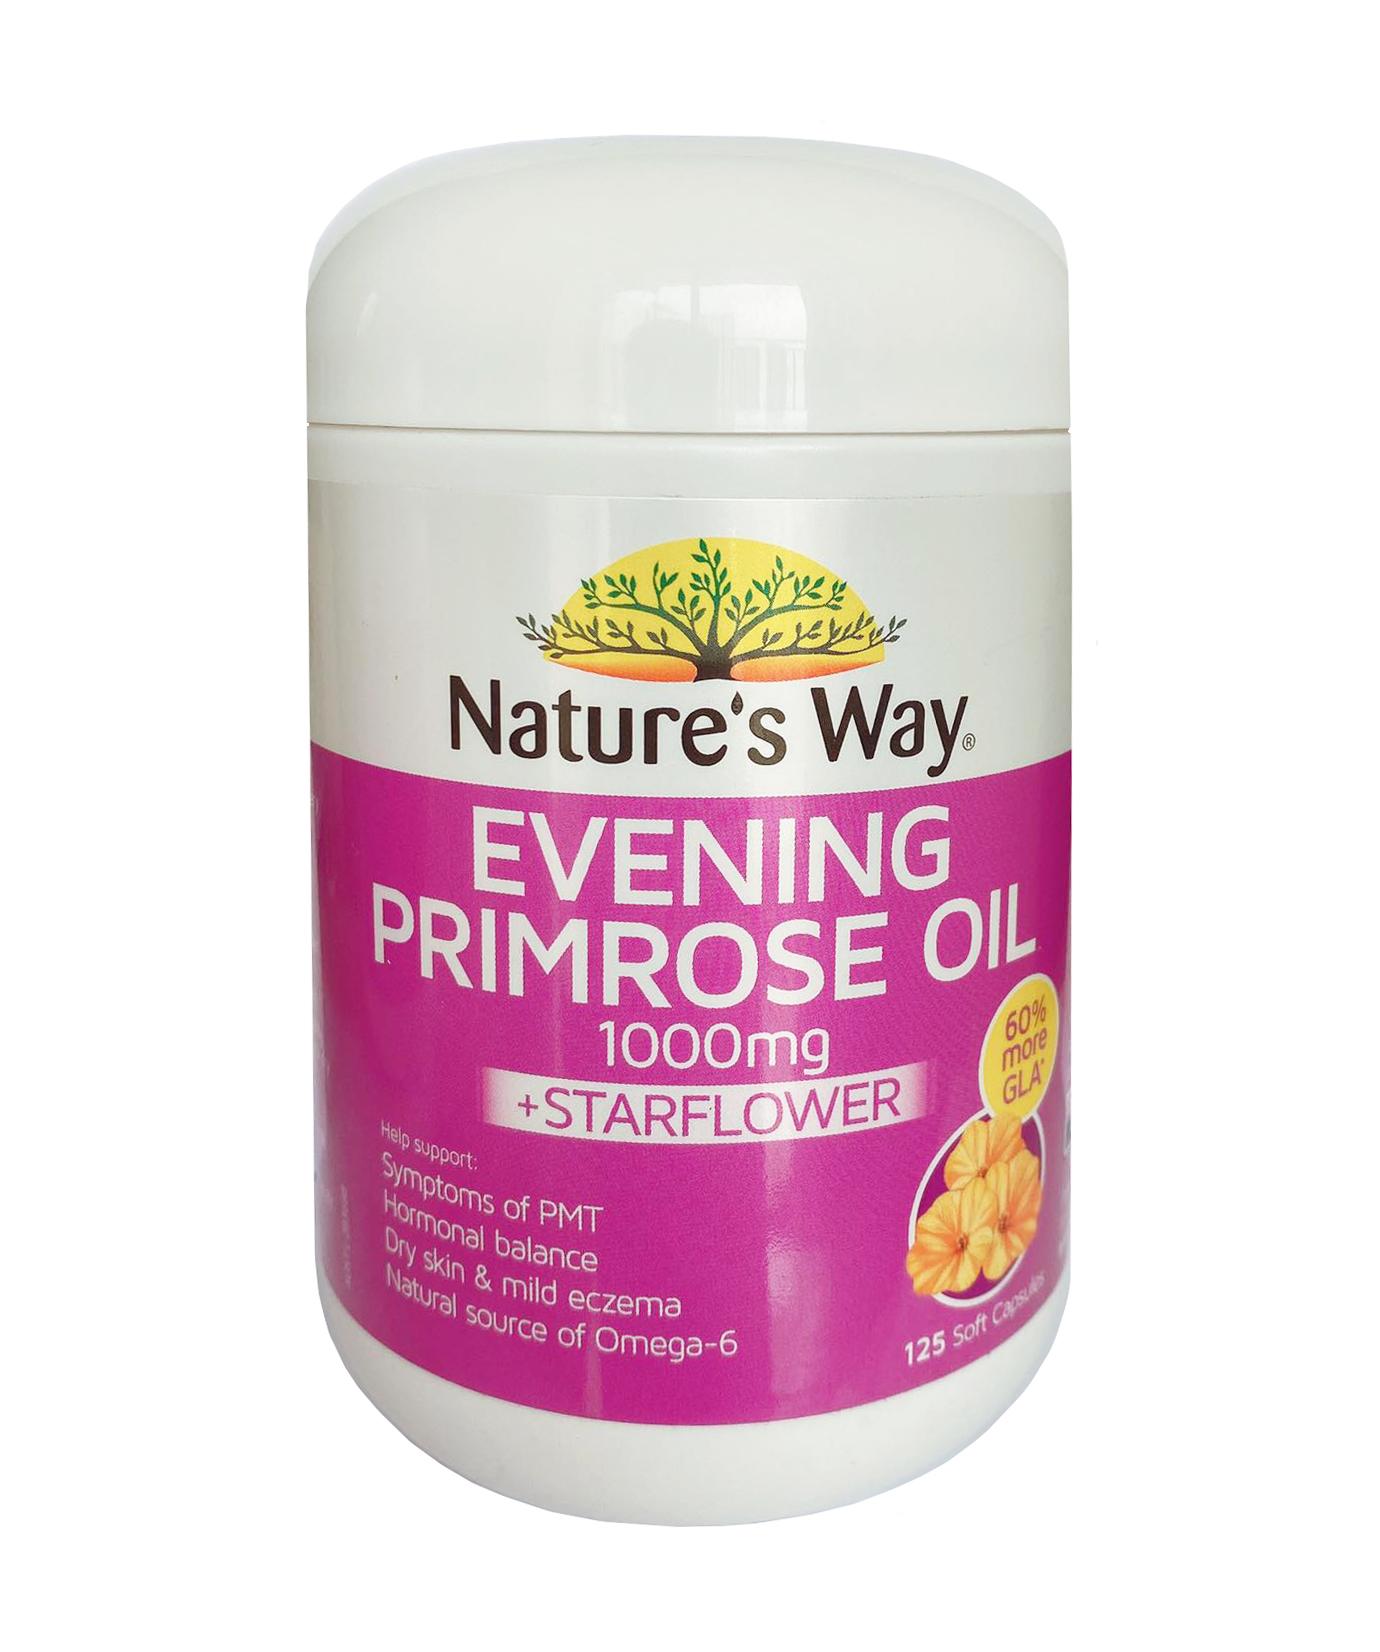 Tinh dầu hoa anh thảo Nature's Way Evening Primrose Oil 125 viên mẫu cũ